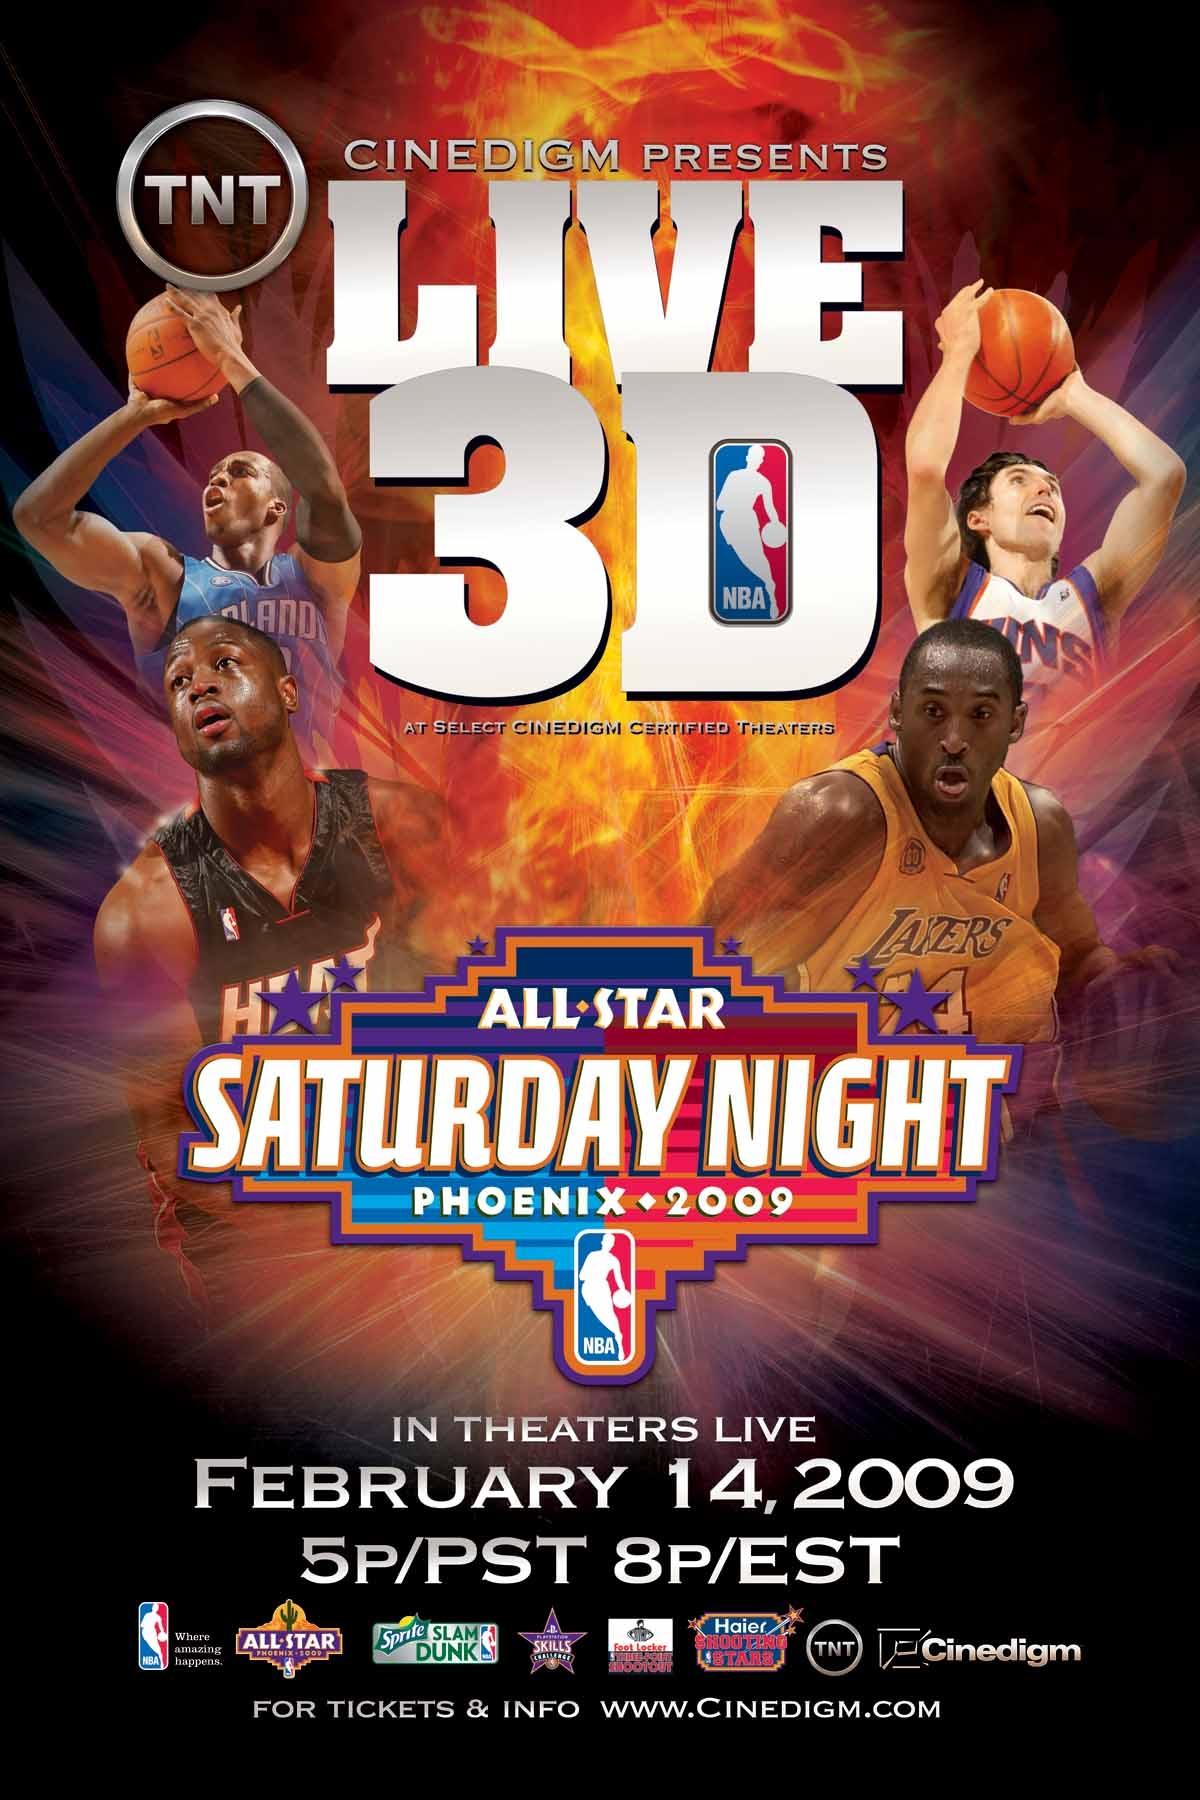 SlashGear's Cinedigm 3D HD NBA Slam Dunk Giveaway!